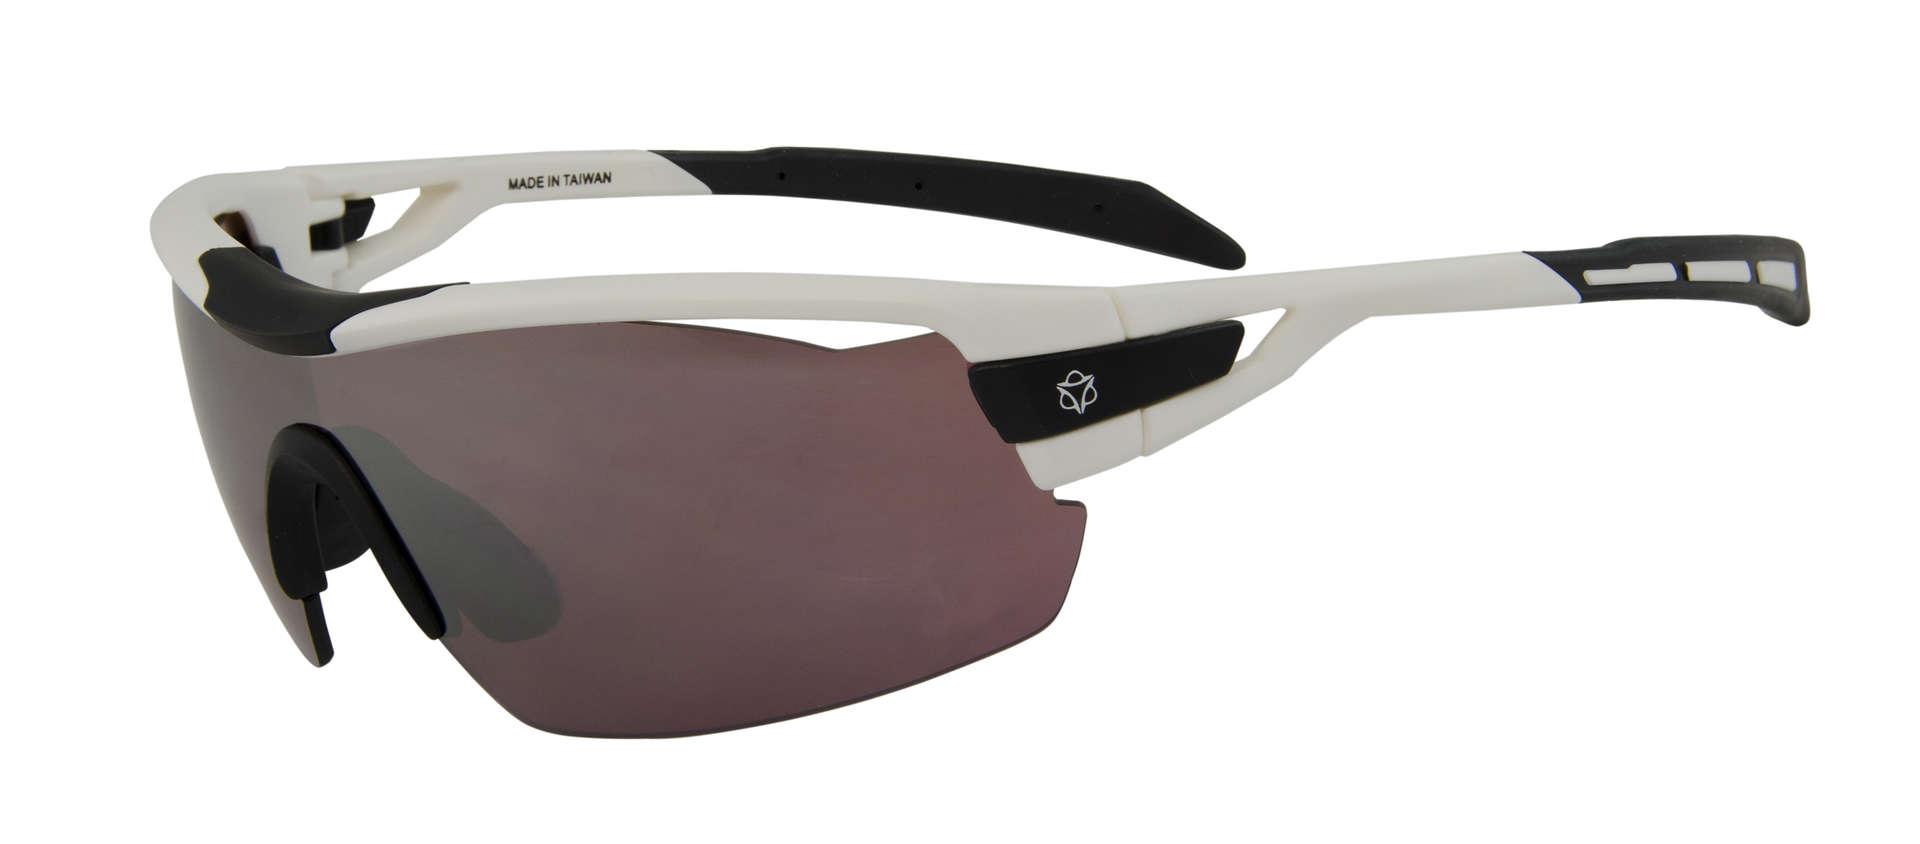 604557878ef0ee AGU Foss Shield HD Fietsbril Wit koop je bij Futurumshop.nl